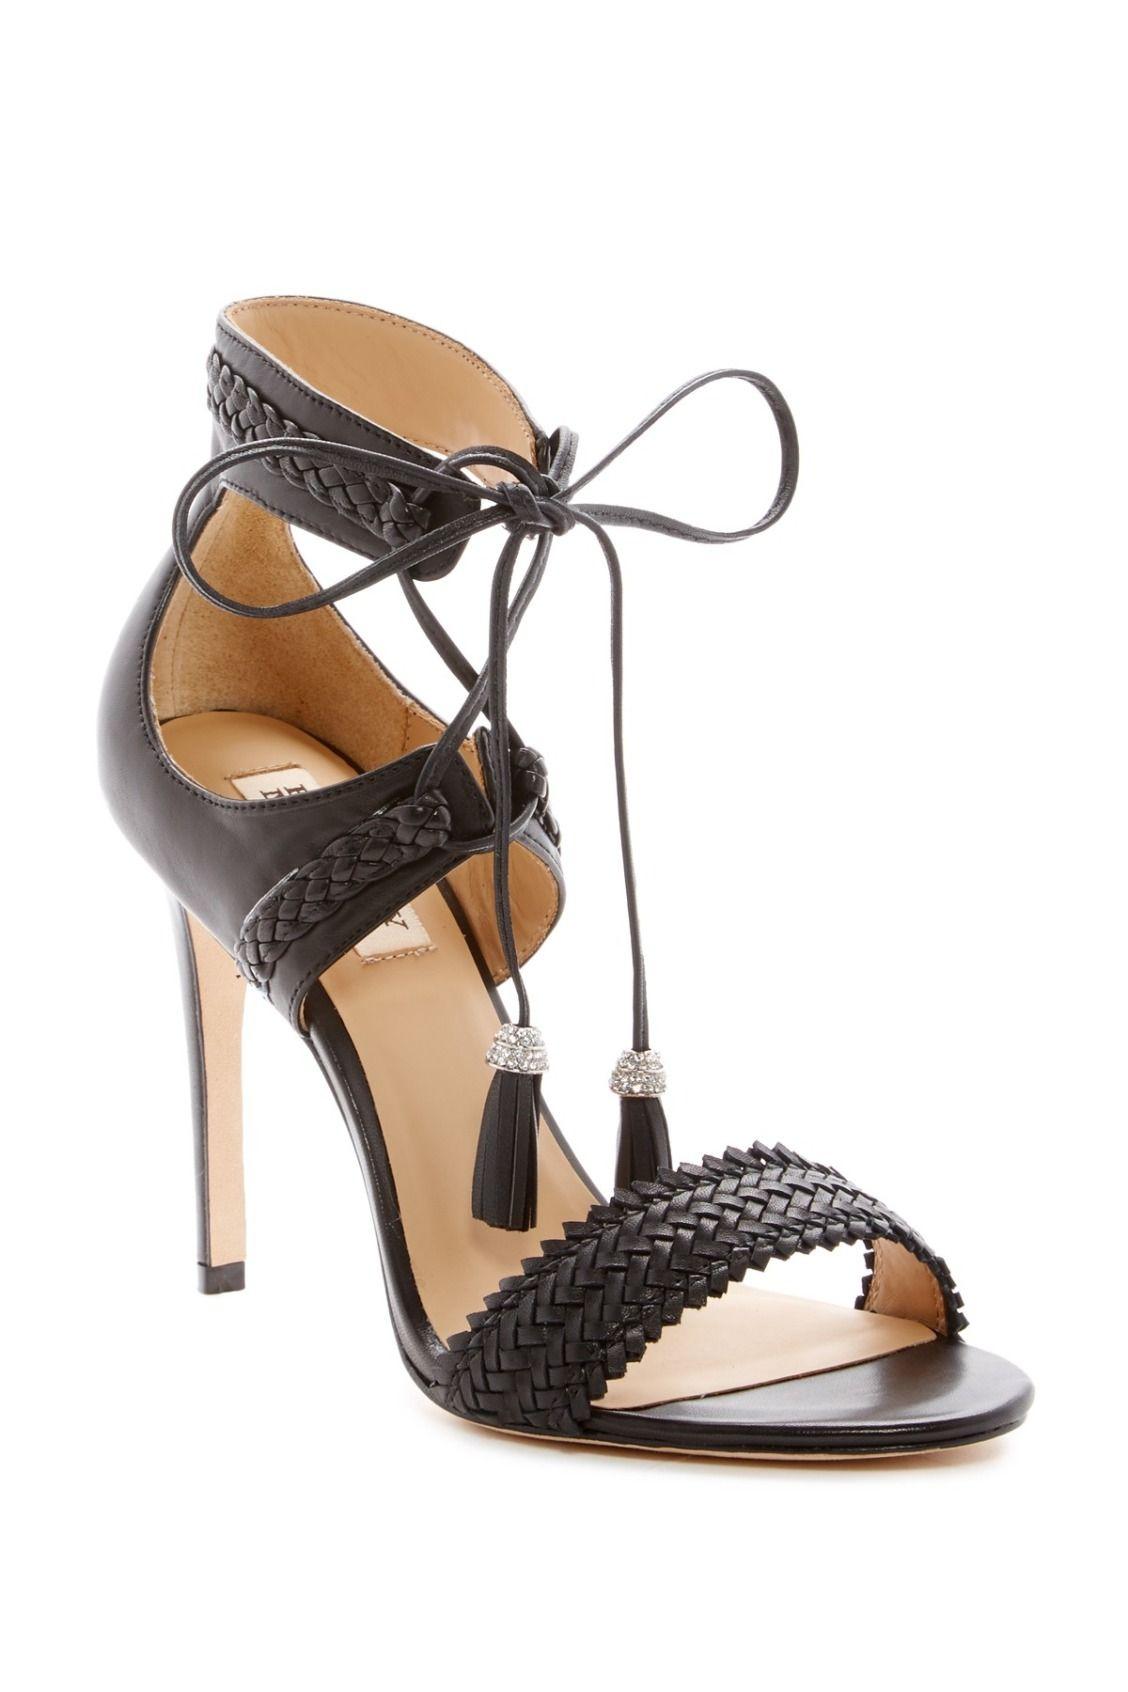 4f4f3d711c38 Stunning Badgley Mischka Bombay Ankle-Tie Sandals